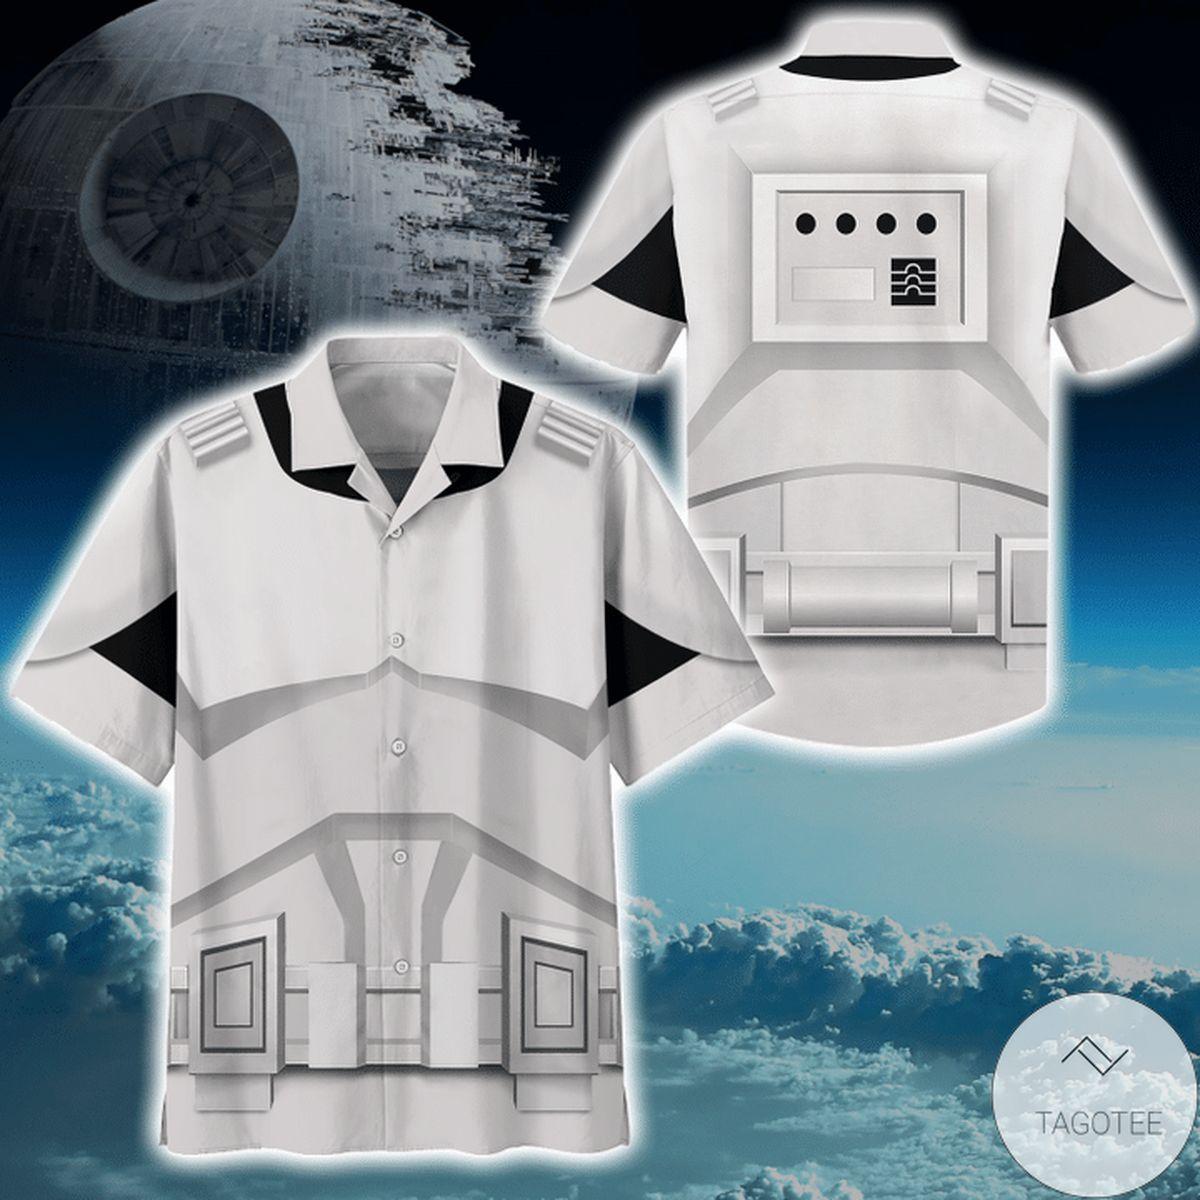 Discount Cosplay Star Wars Stomstroper Print Unisex Hawaiian Shirt